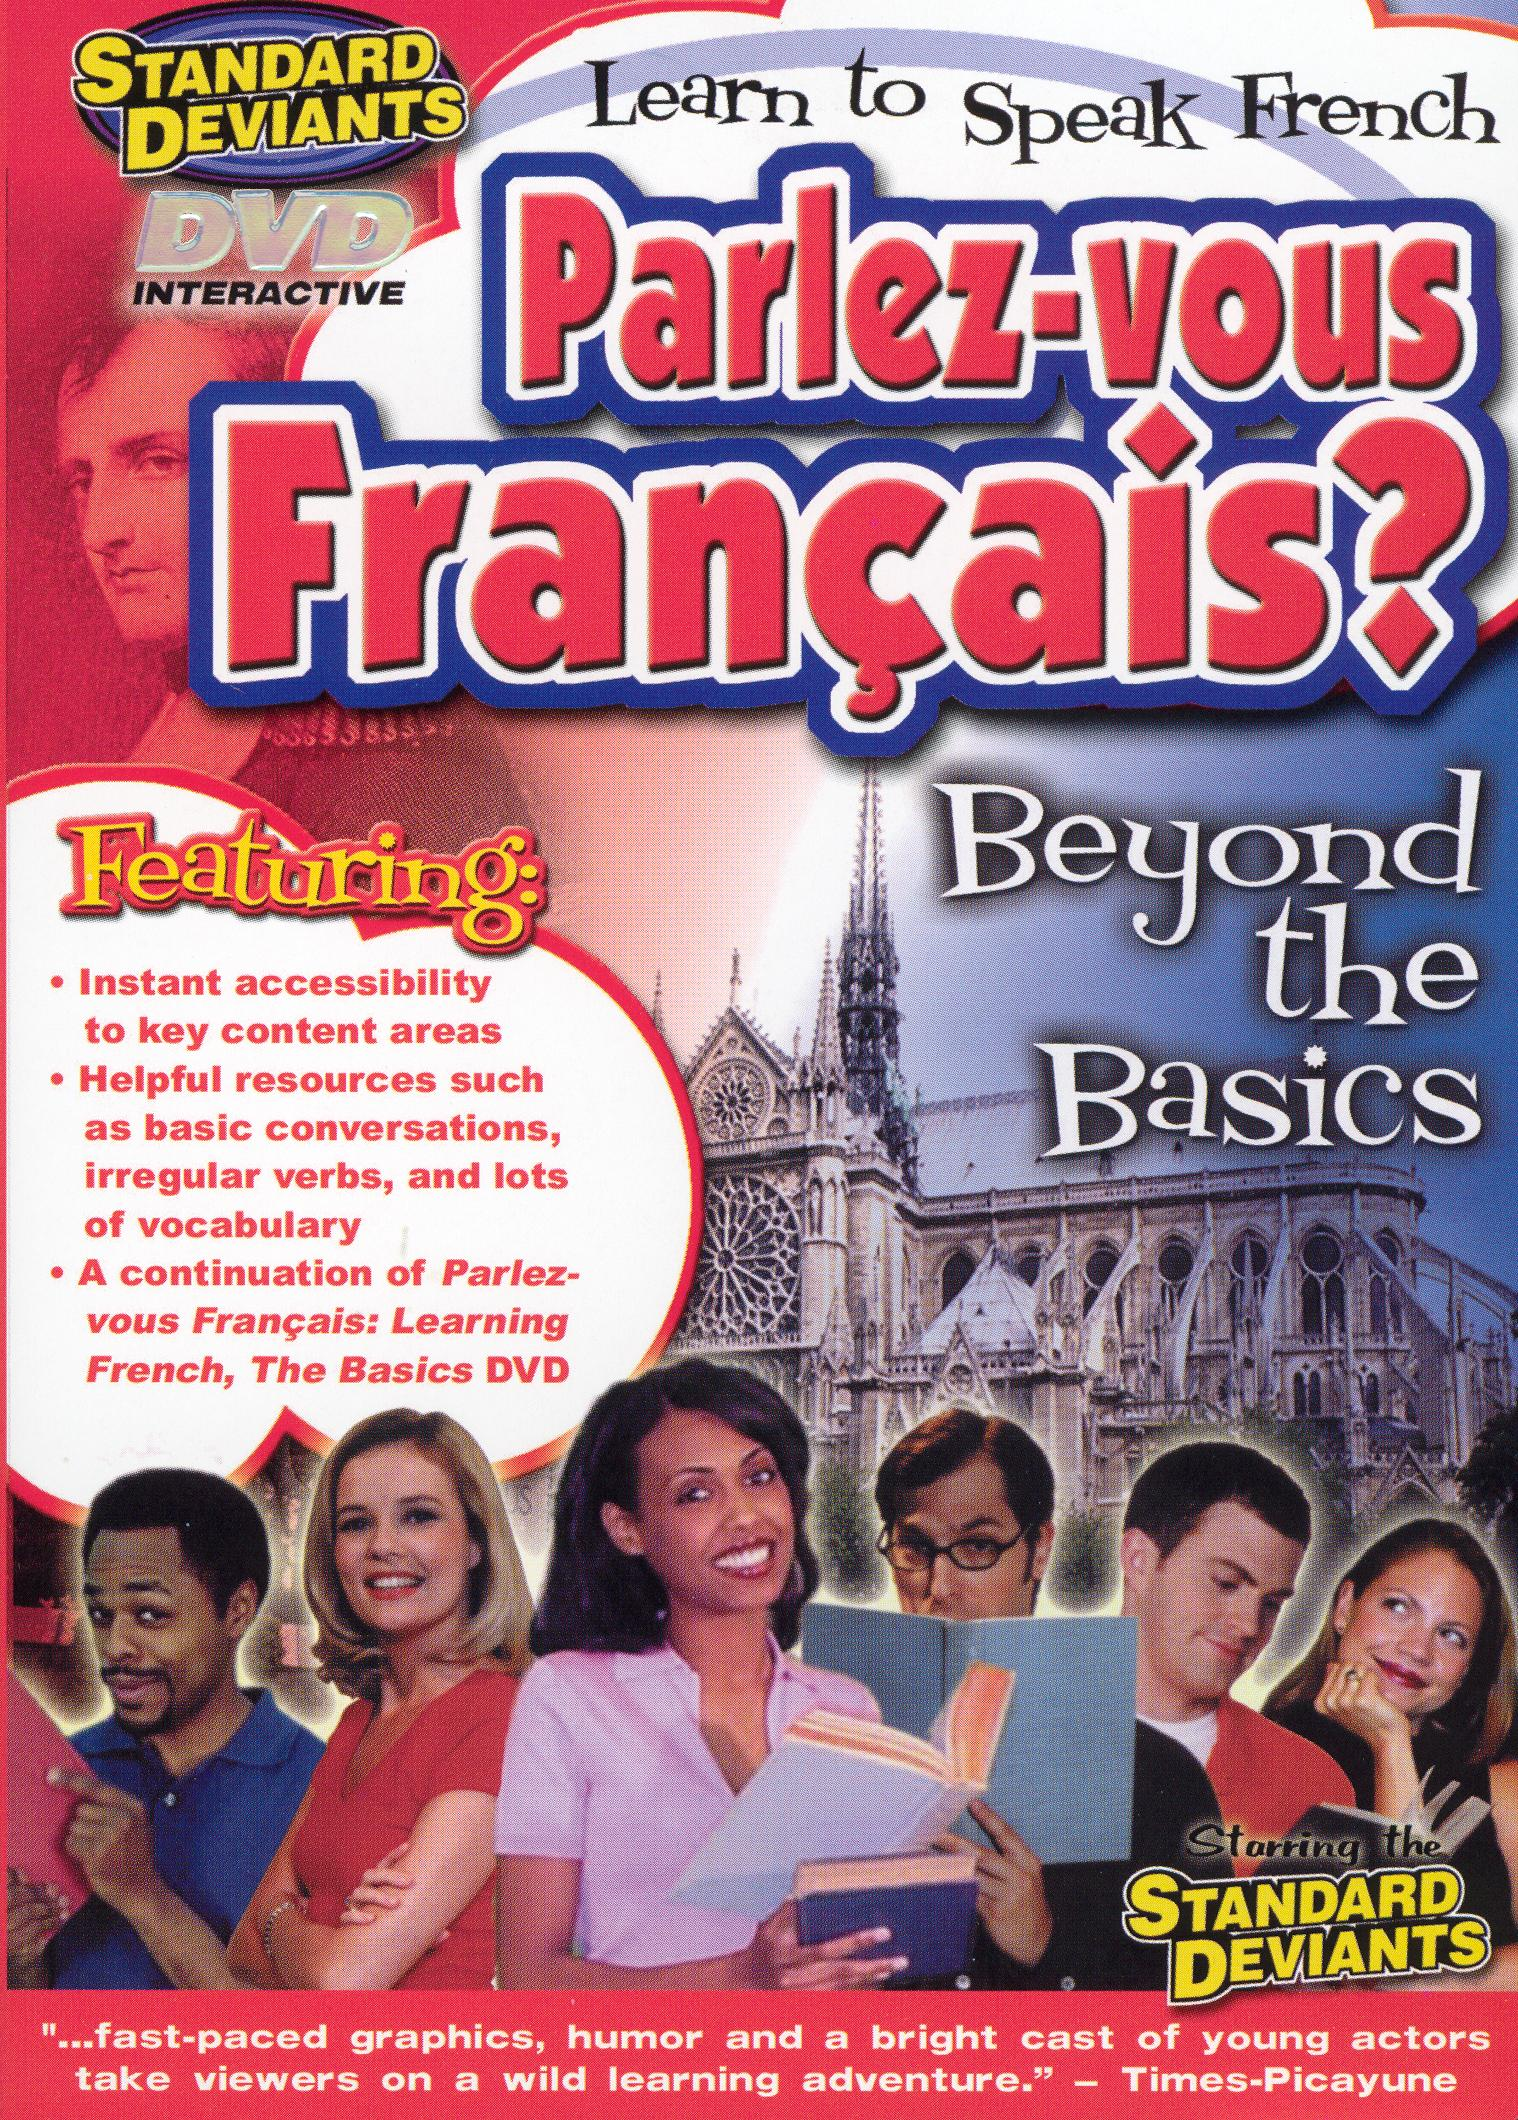 The Standard Deviants: Parlez-Vous Français? Learn to Speak French - Beyond the Basics